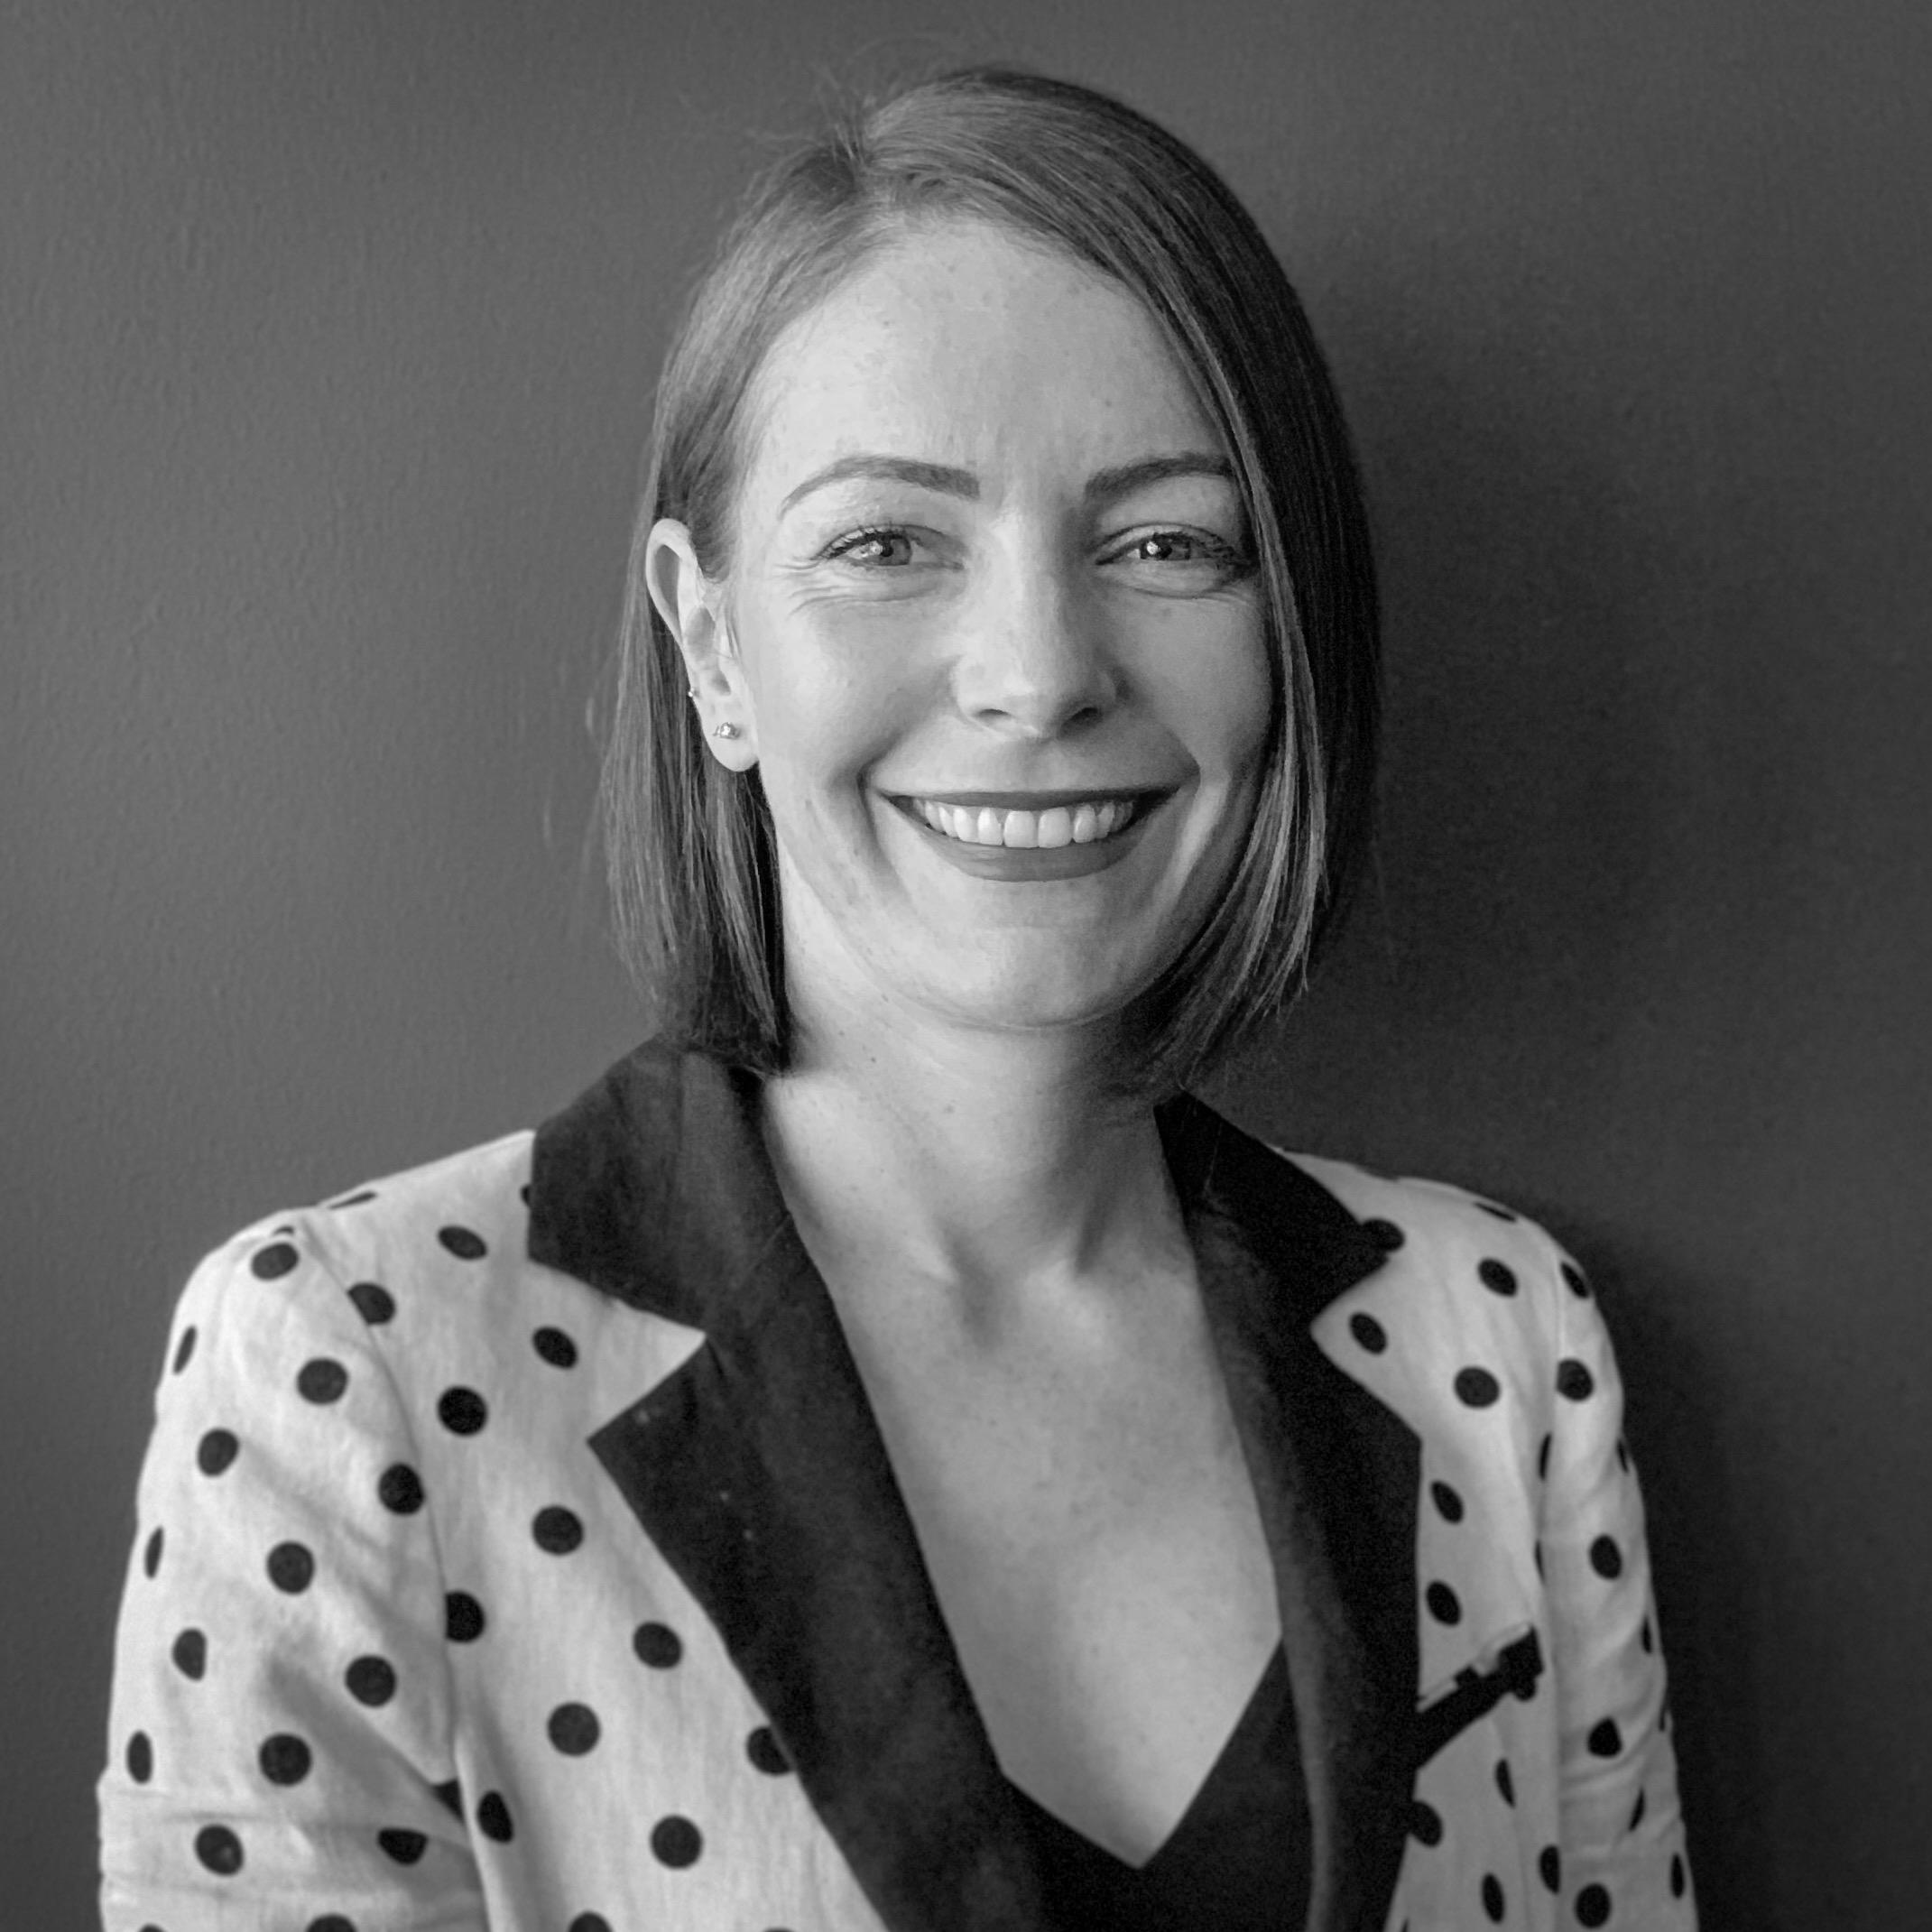 Mango Melbourne GM Jess Allison